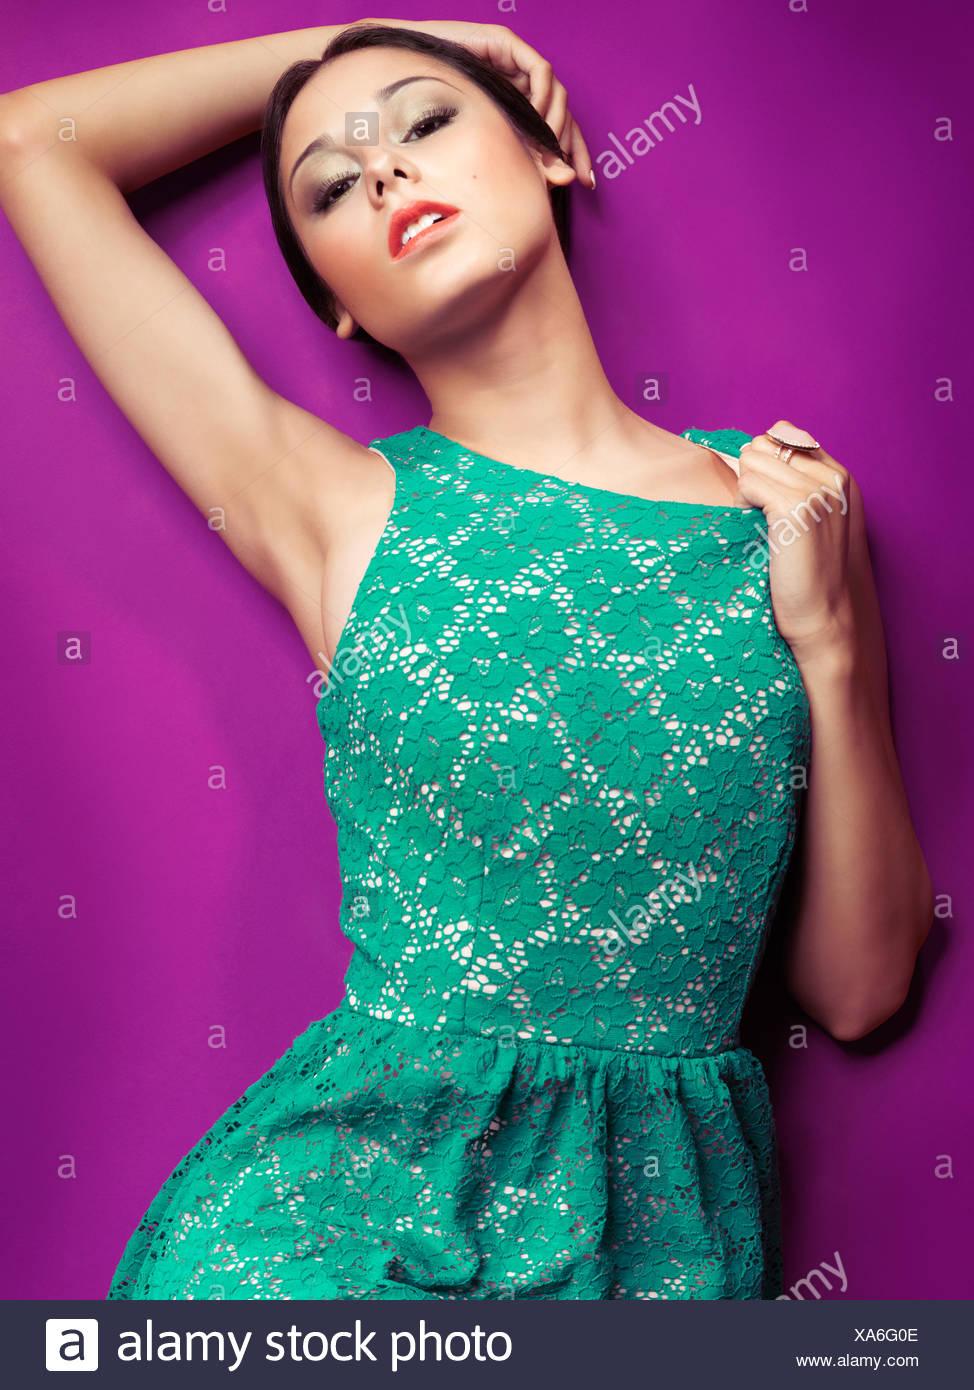 frau trägt ein grünes kleid retro-stil stockfotografie - alamy